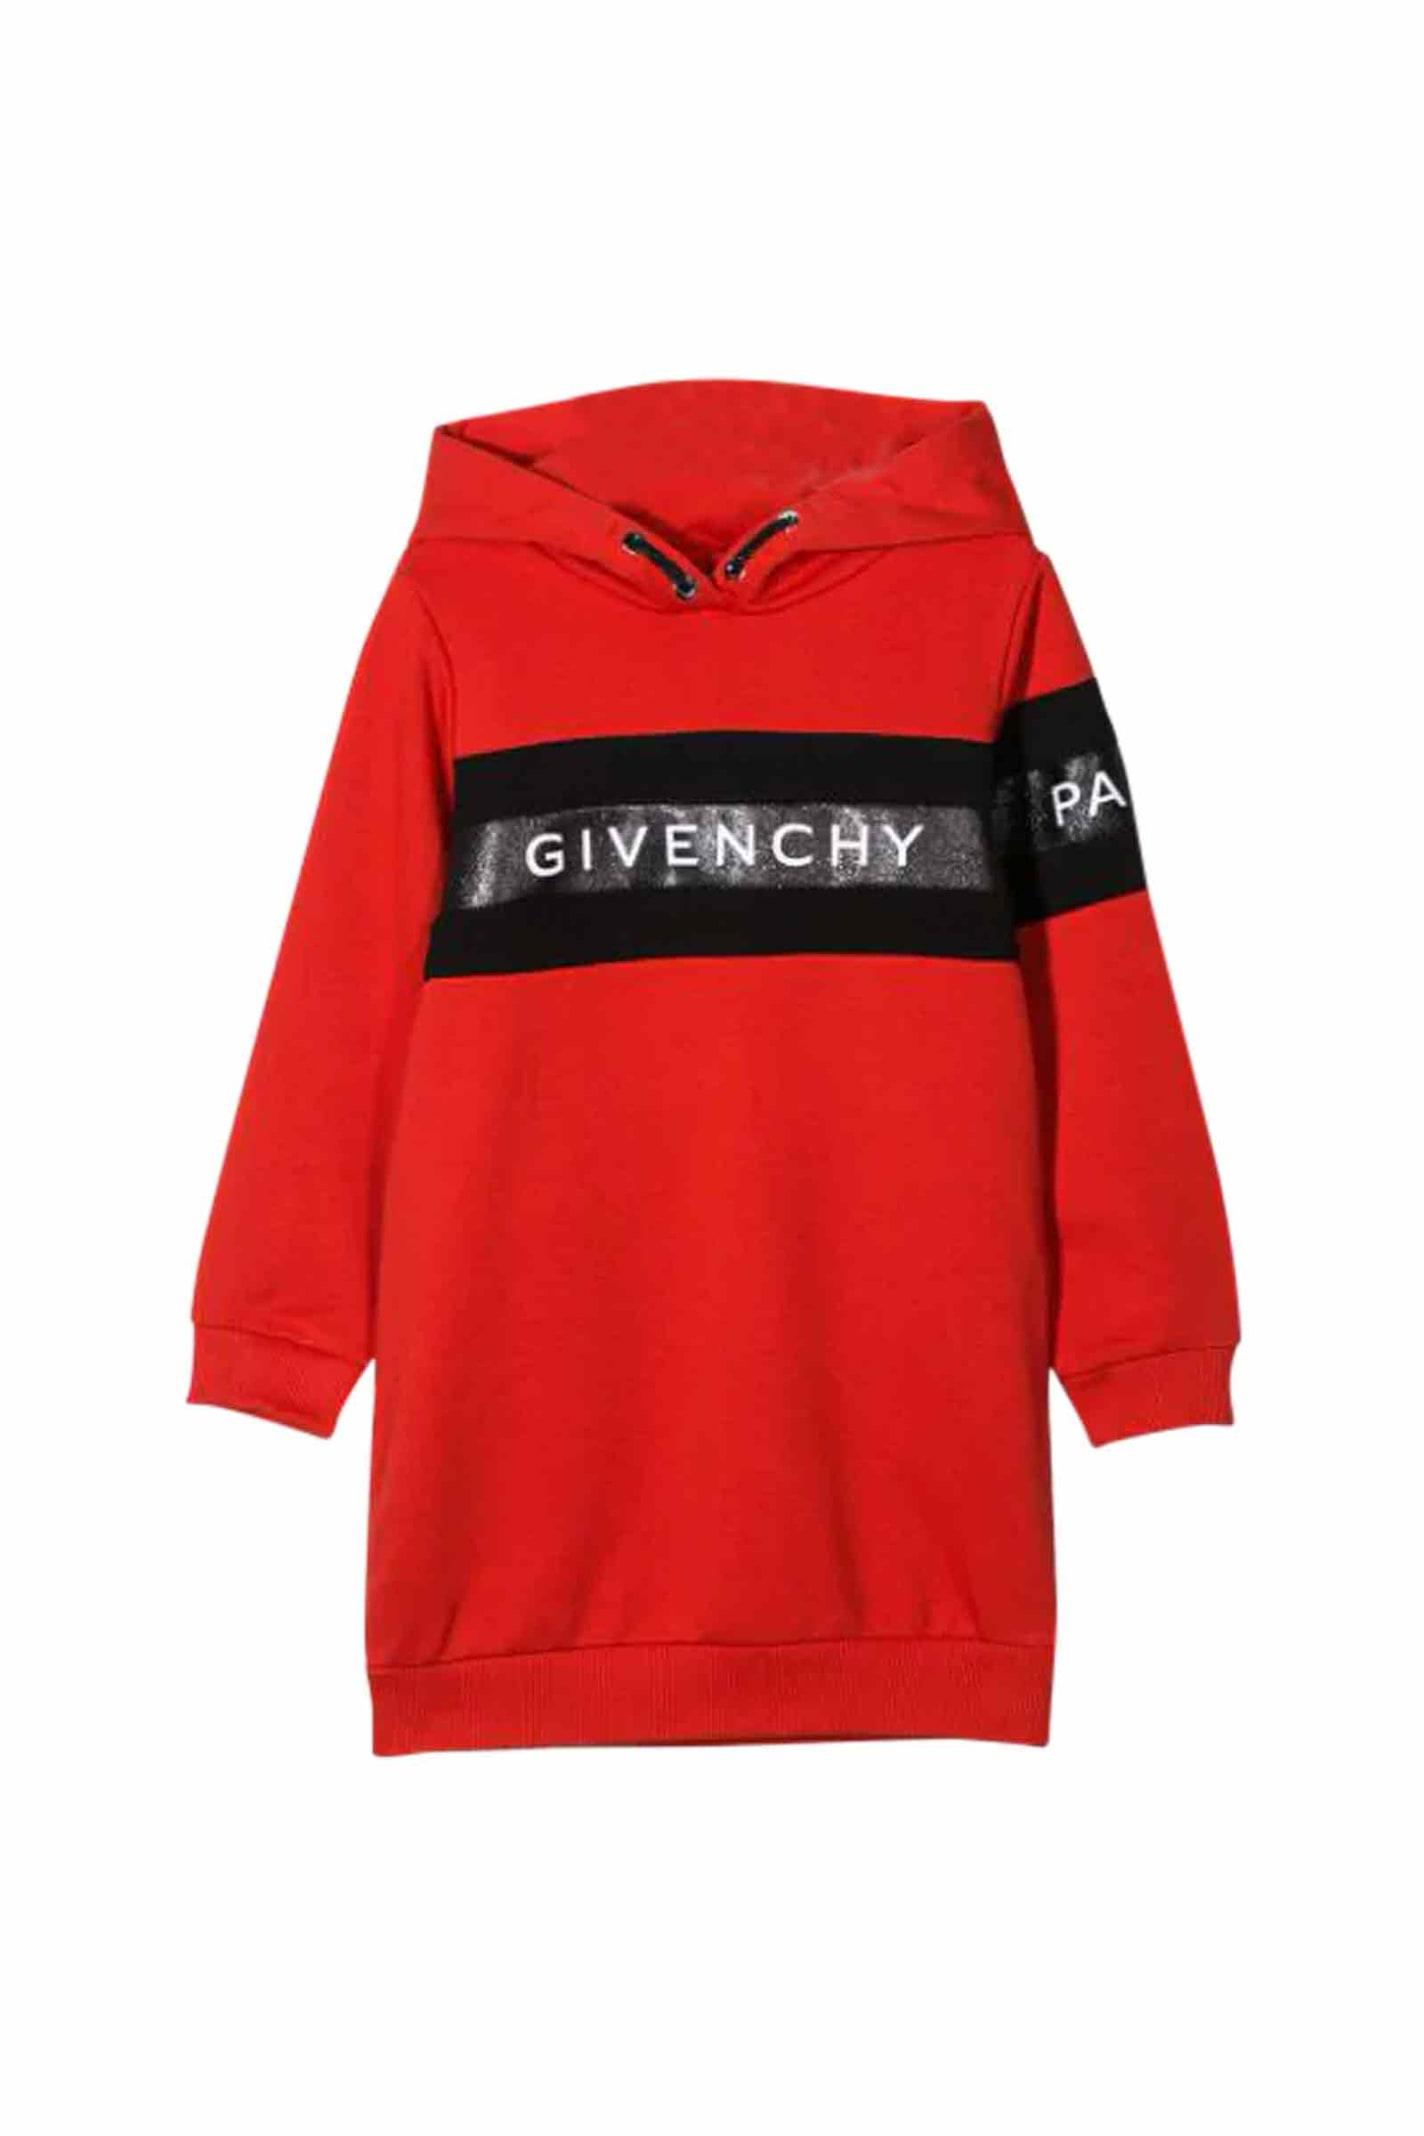 Givenchy Sweatshirts Dress Style With Logo